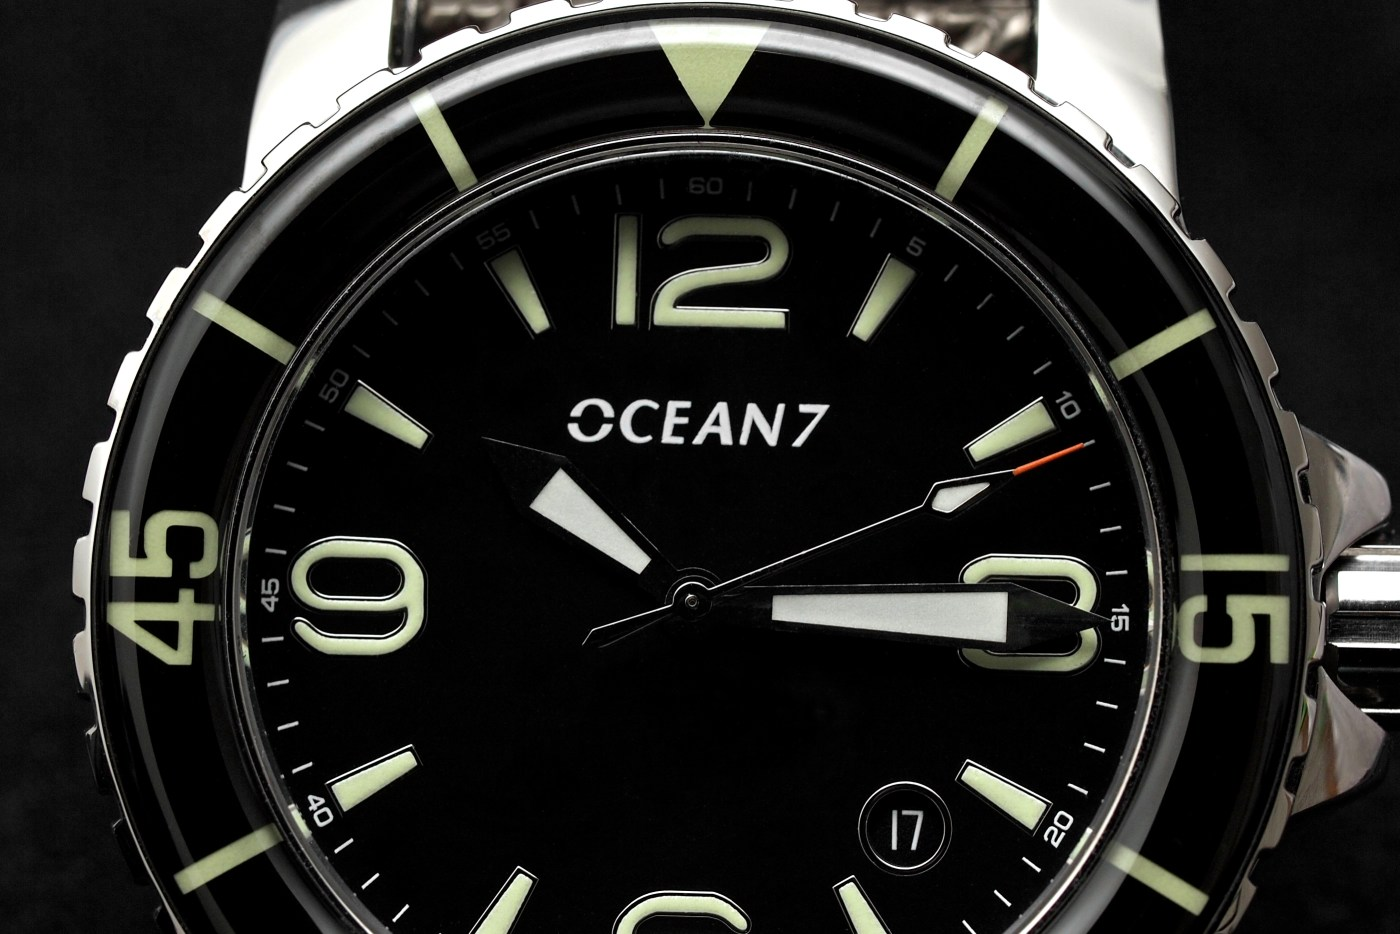 Ocean 7 LM-5